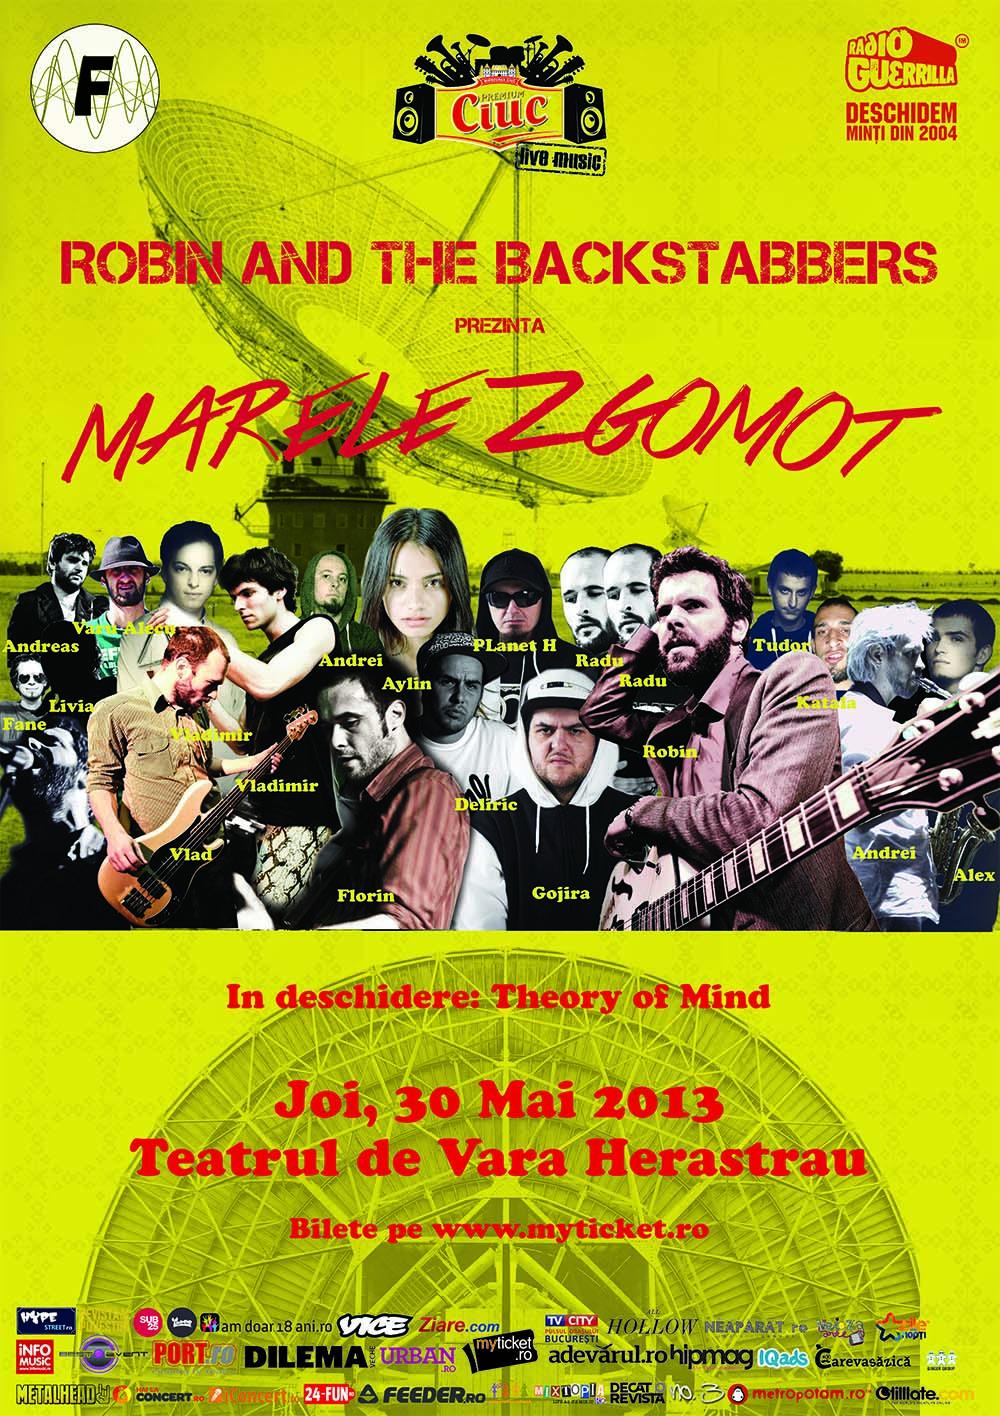 Robin and the Backstabbers in Herastrau